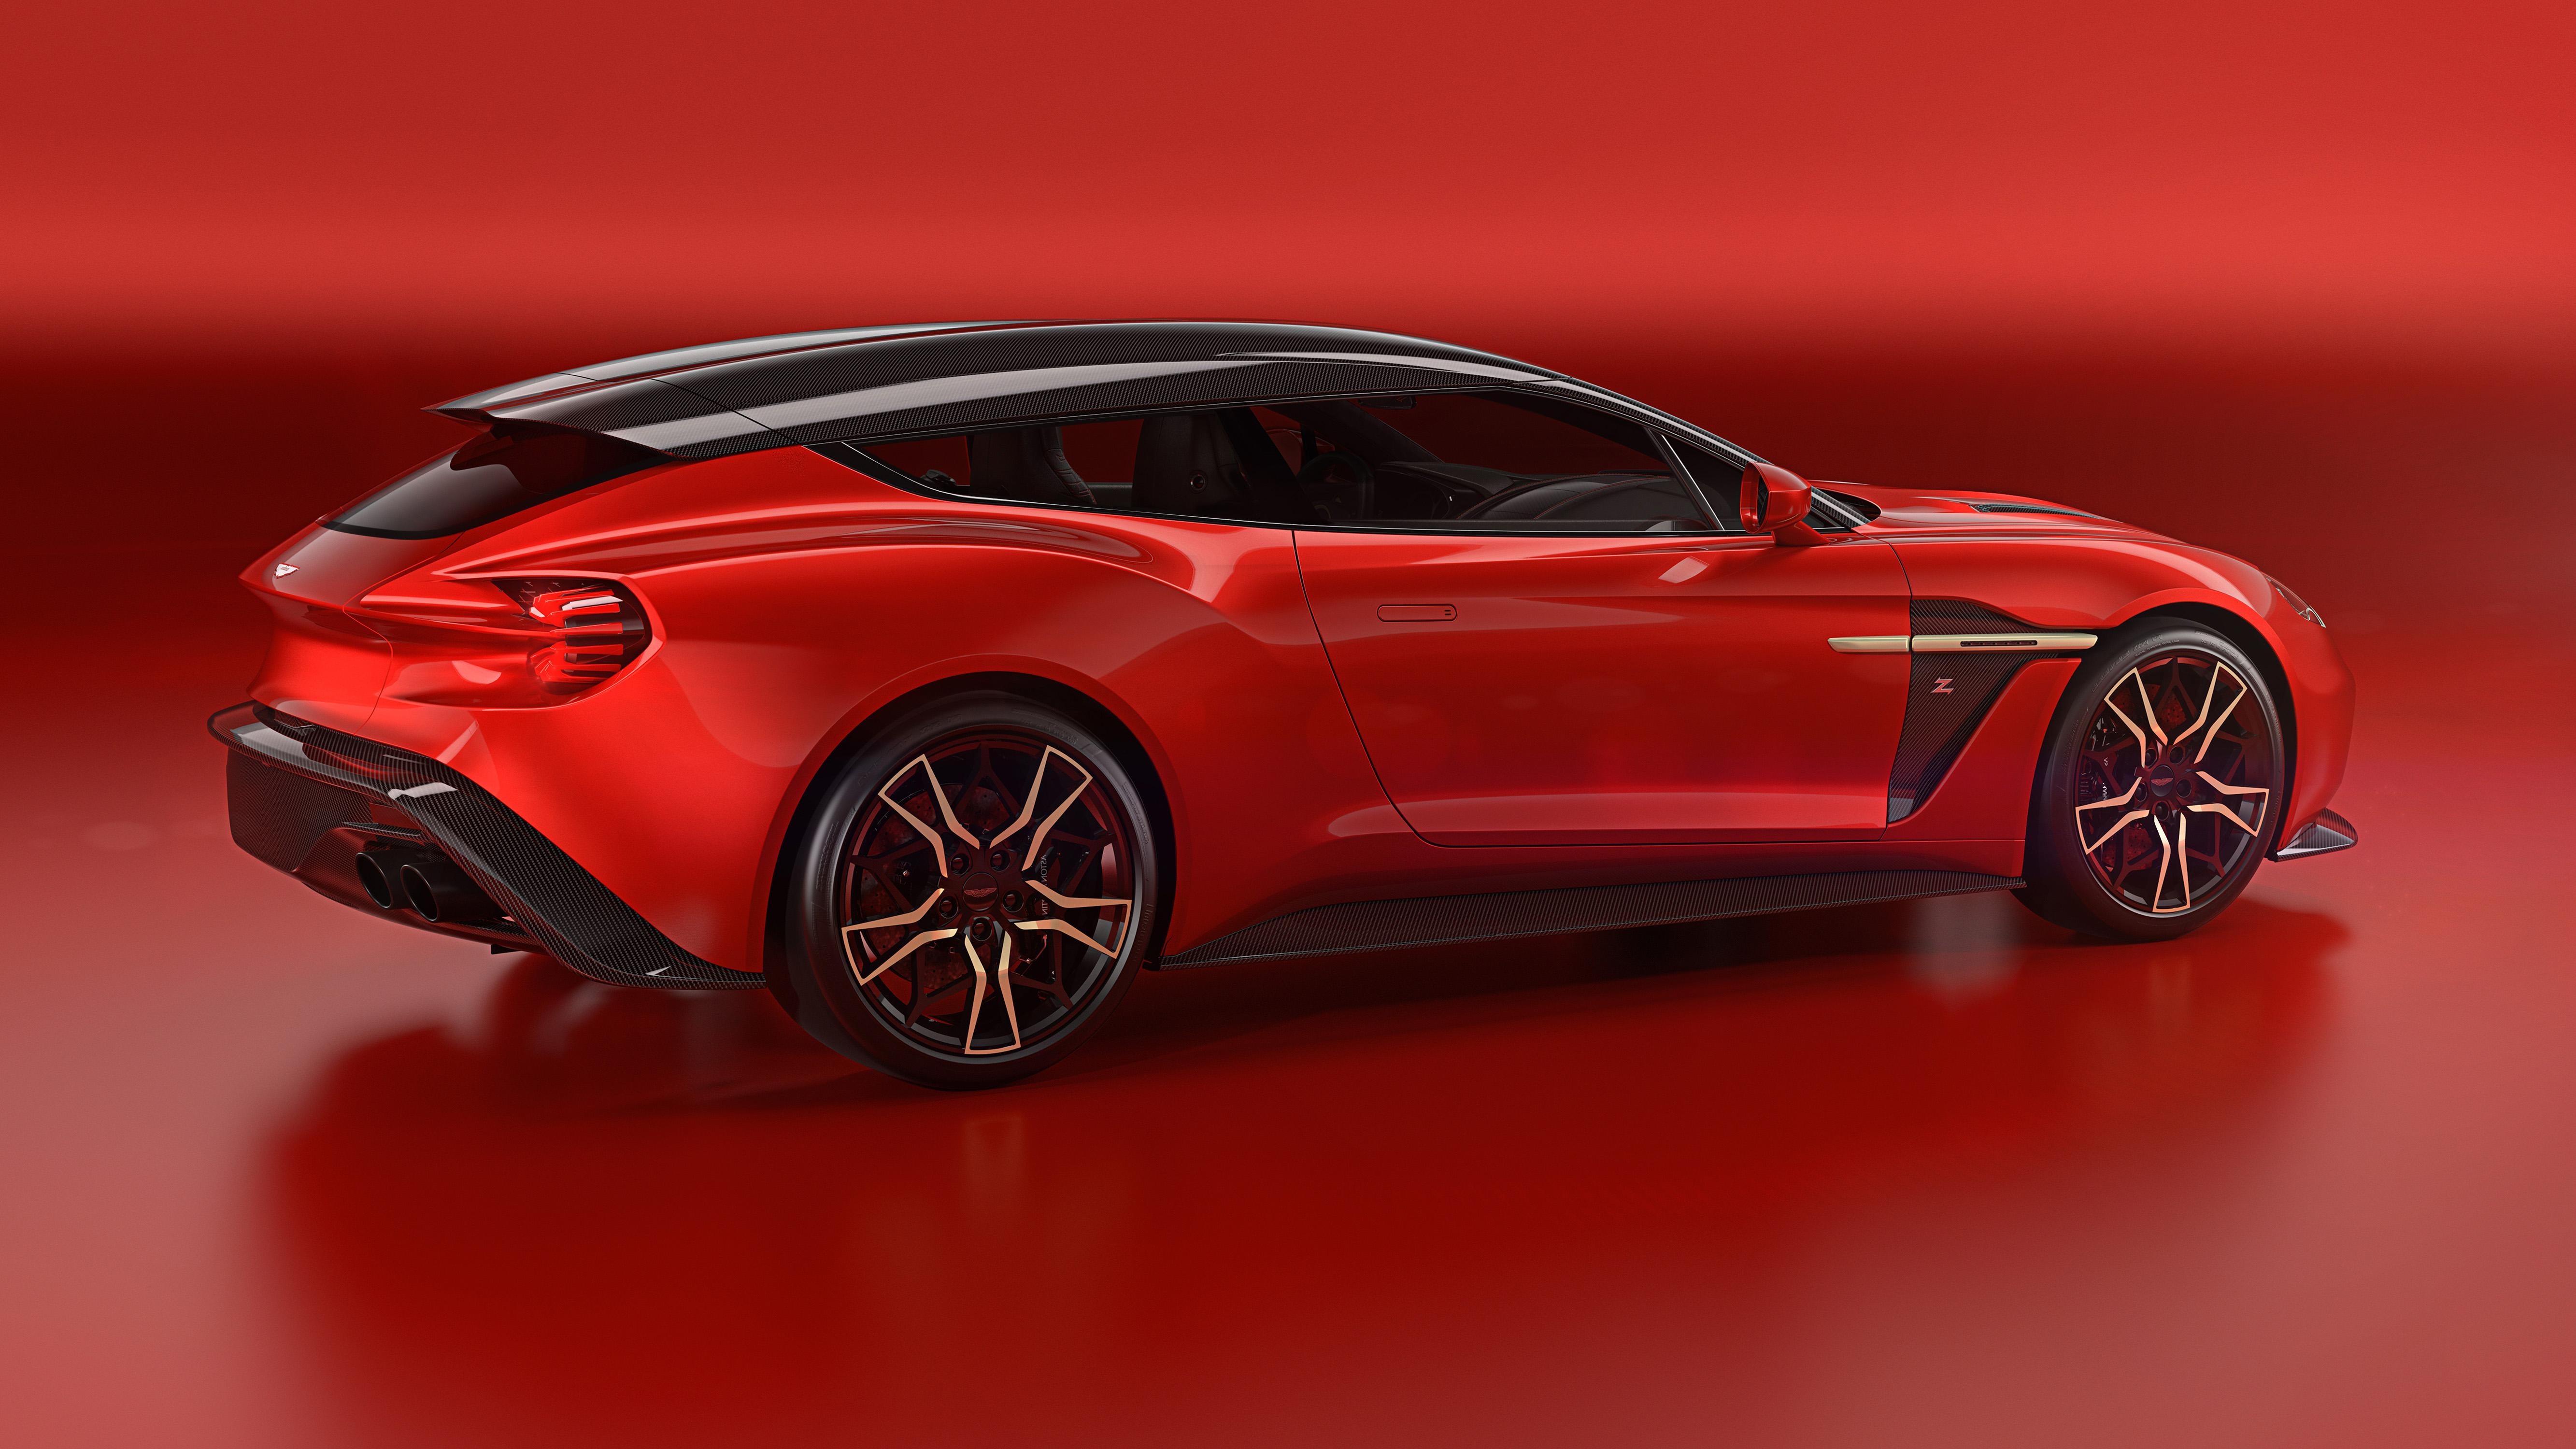 Aston Martin Vanquish Zagato Shooting Brake side